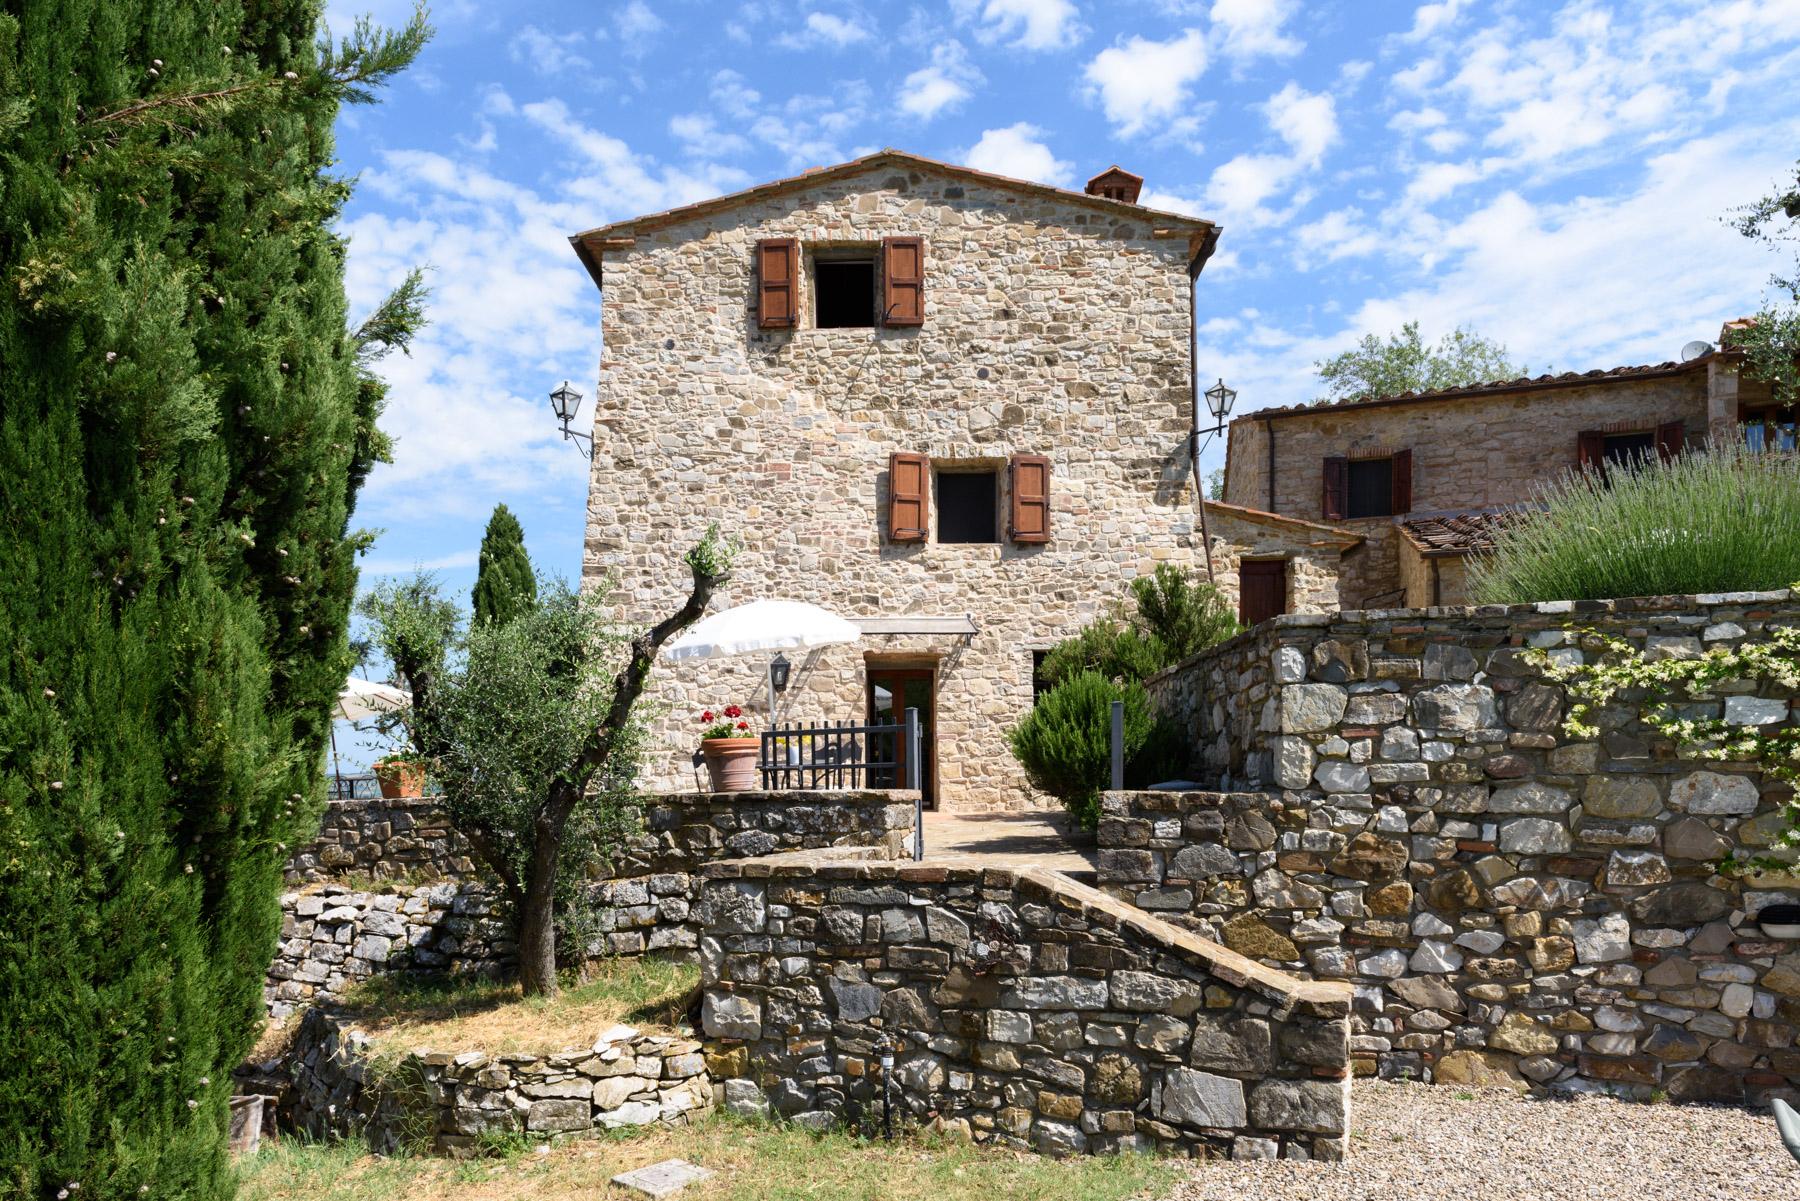 Rustico in Vendita a Castellina In Chianti: 5 locali, 650 mq